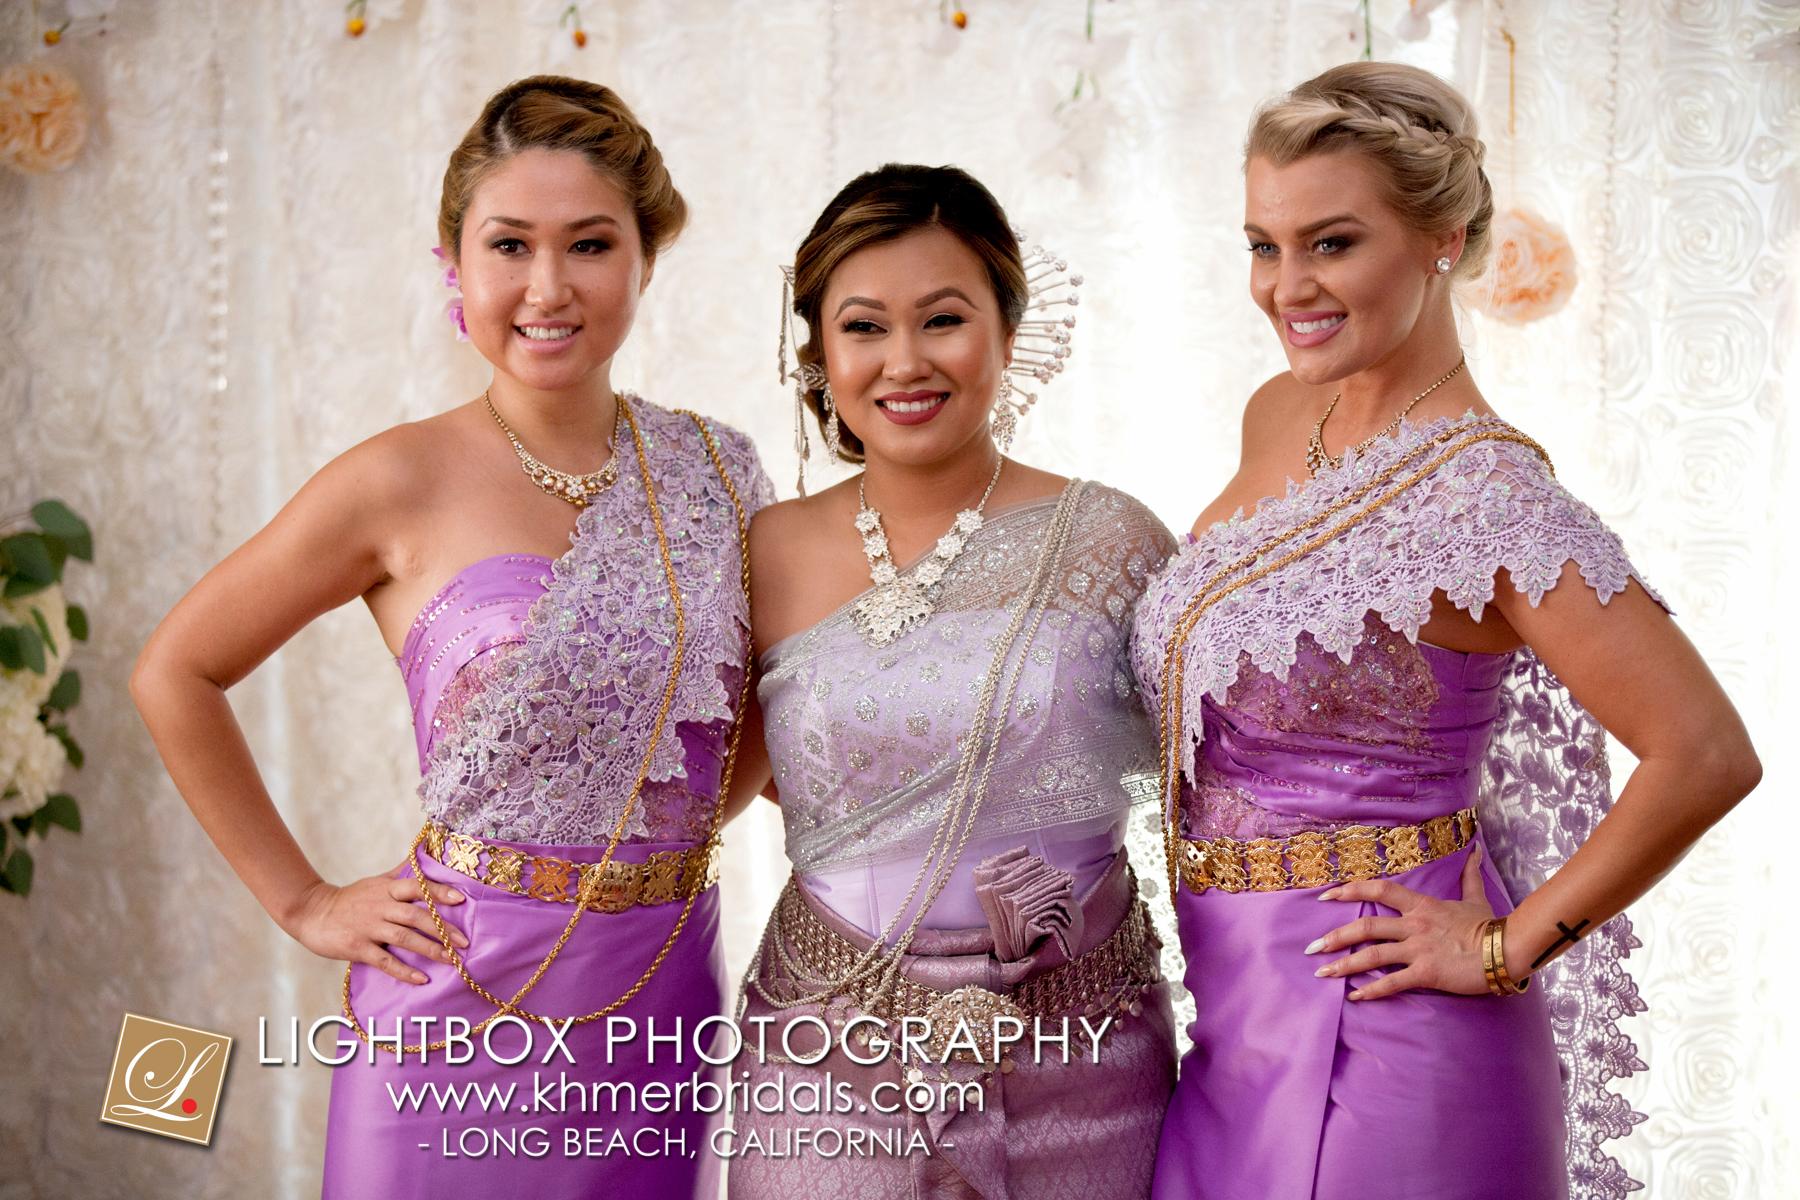 Khmer Bridal Wedding Photography video Apsara Studio Oufit-123.jpg